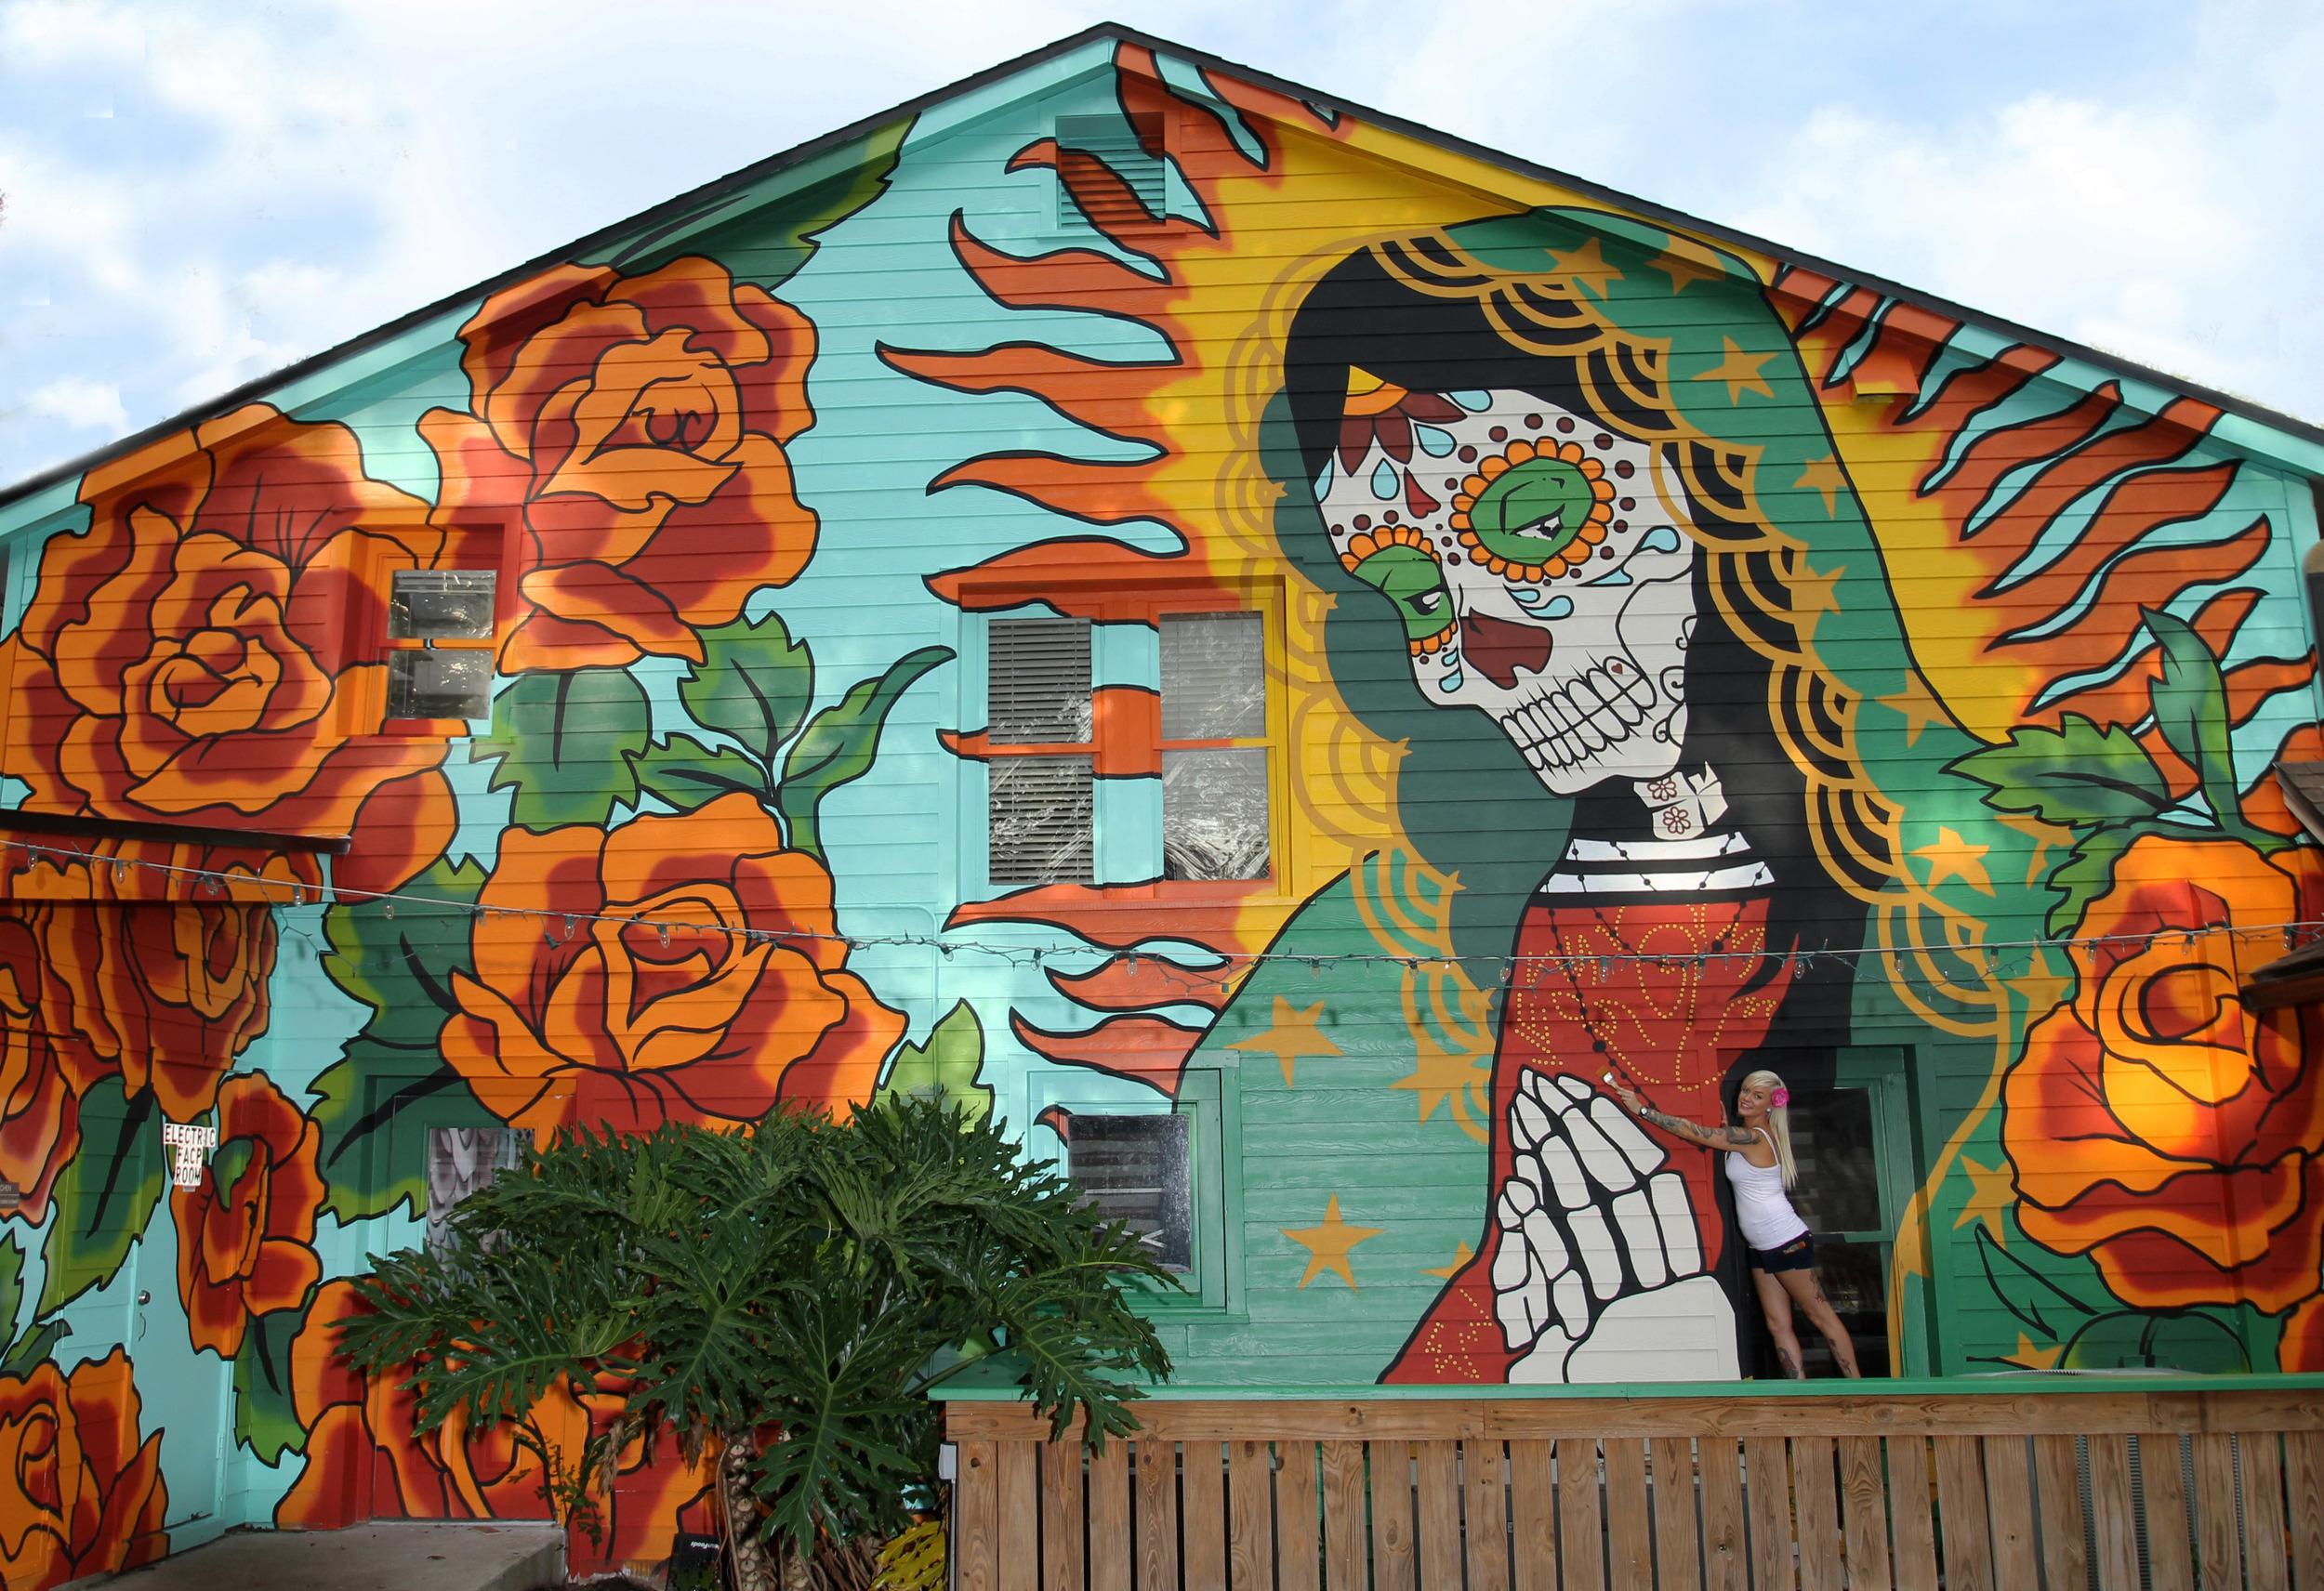 Sugar Skull Guadalupe, August 2012,Exteior Paint, 2 story high building, TacoLu Jacksonville FL, Debbie Nicol.jpg